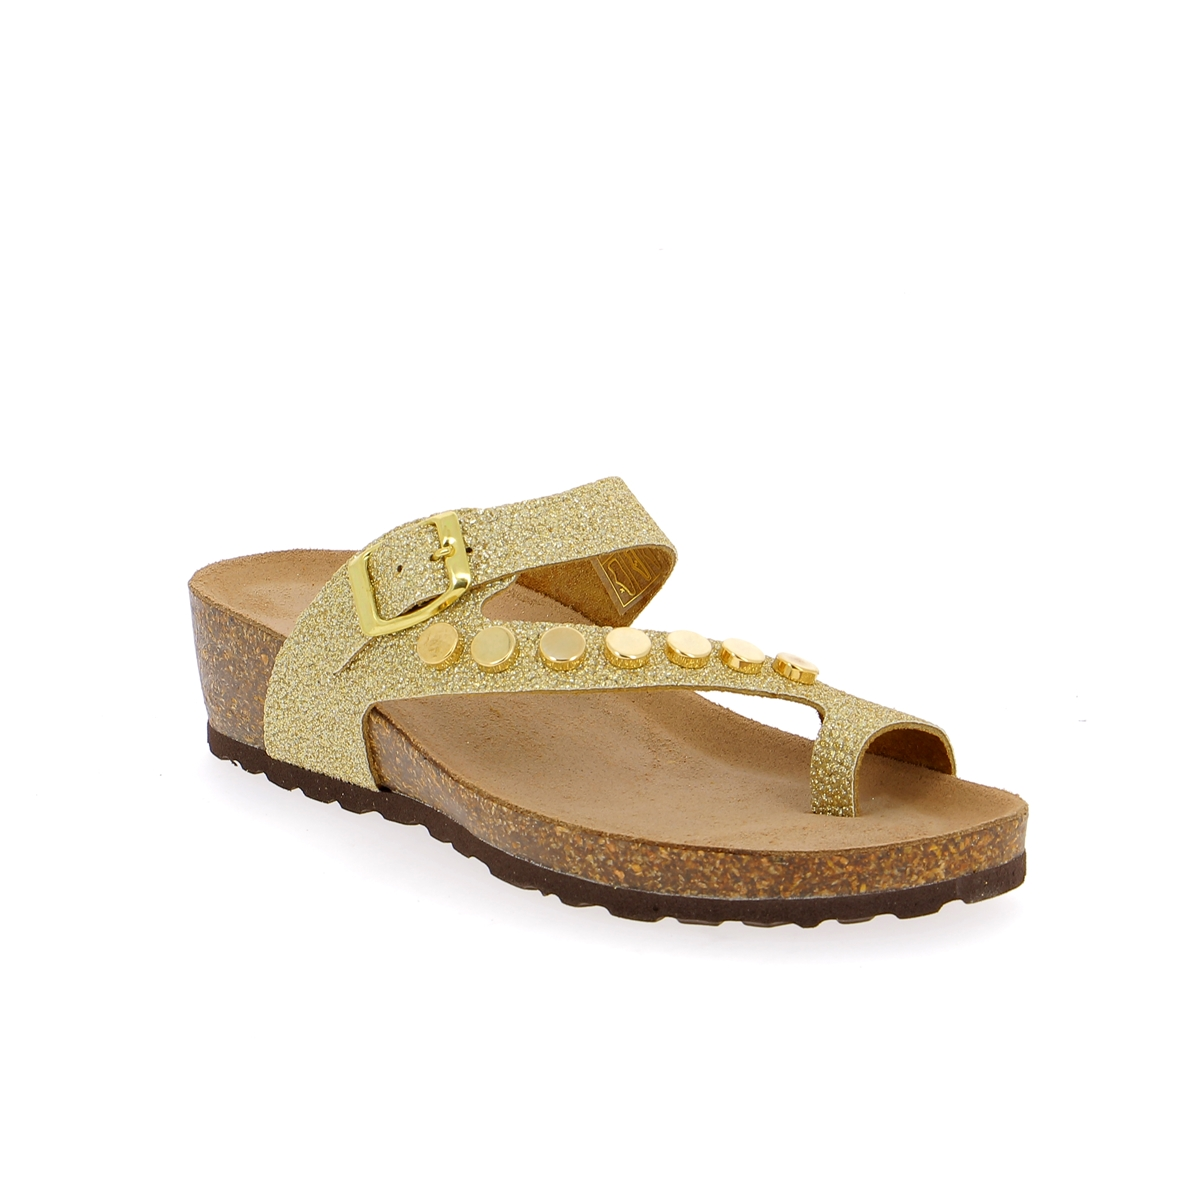 Scapa Muiltjes - slippers goud